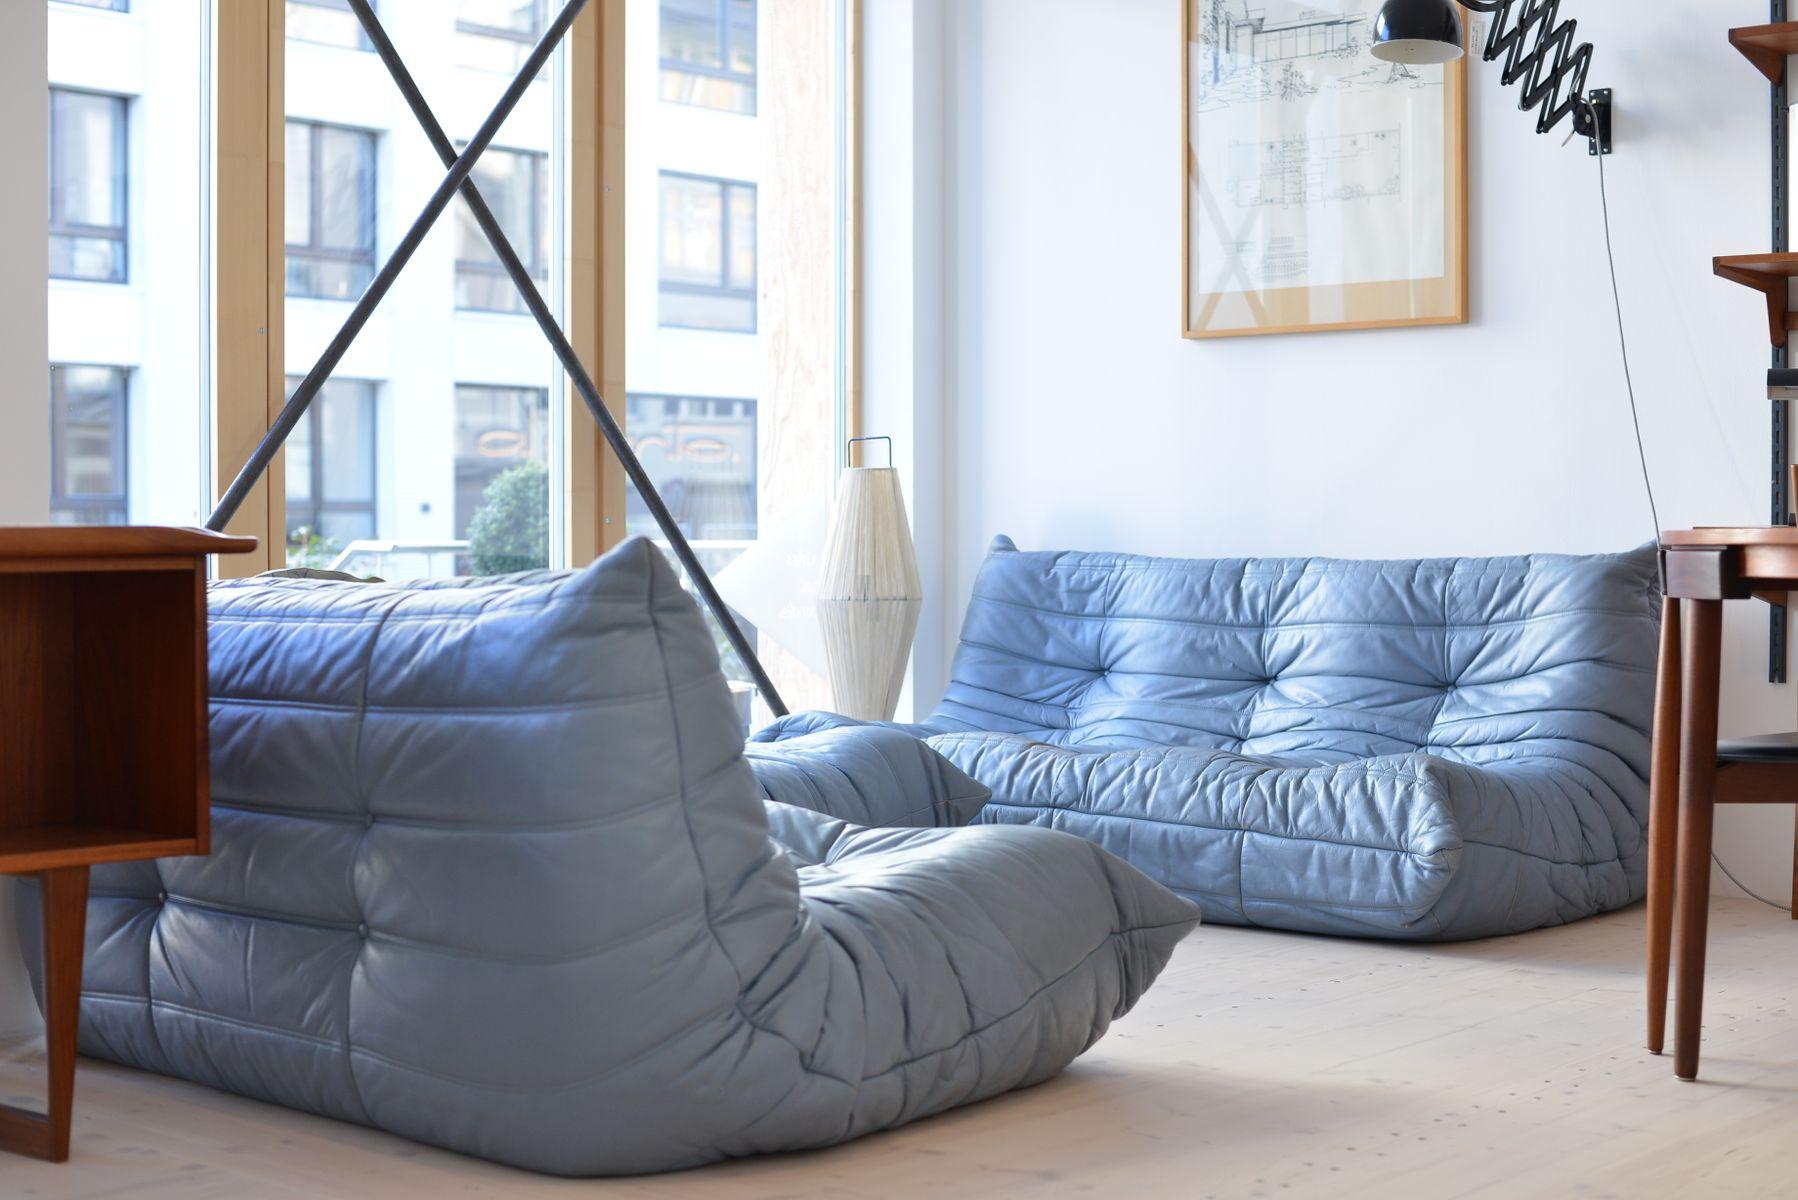 Blue Leather Togo Living Room Set By Michel Ducaroy For Ligne Roset 1970s For Sale At Pamono